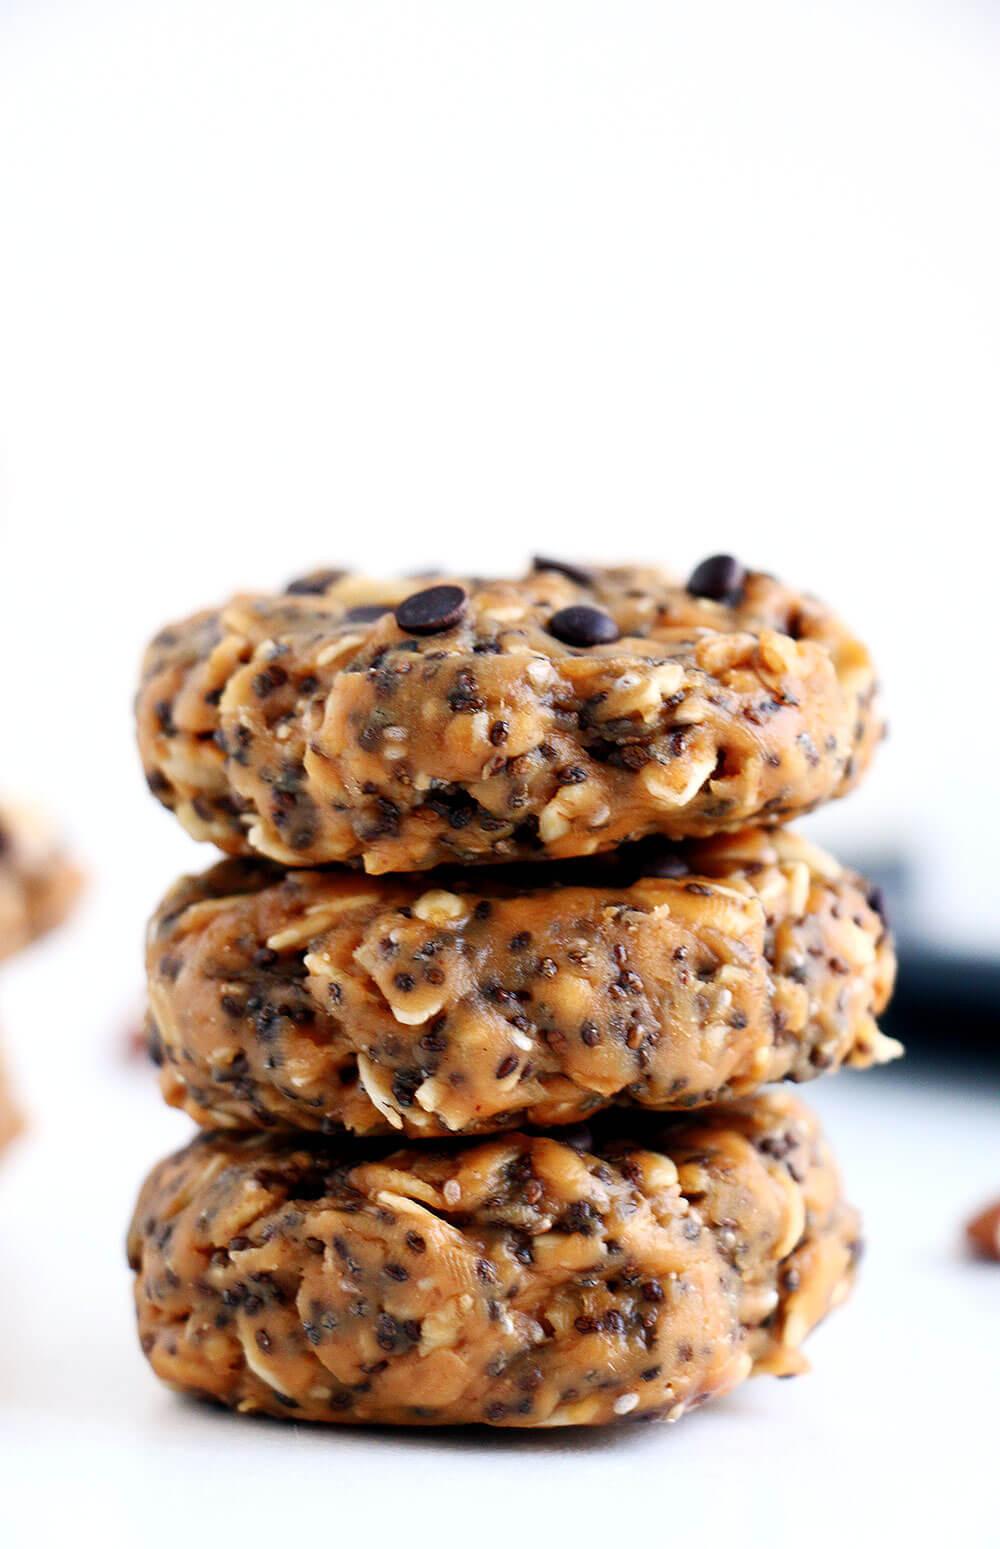 Healthy Baked Snacks  No Bake Breakfast Cookies I Heart Nap Time